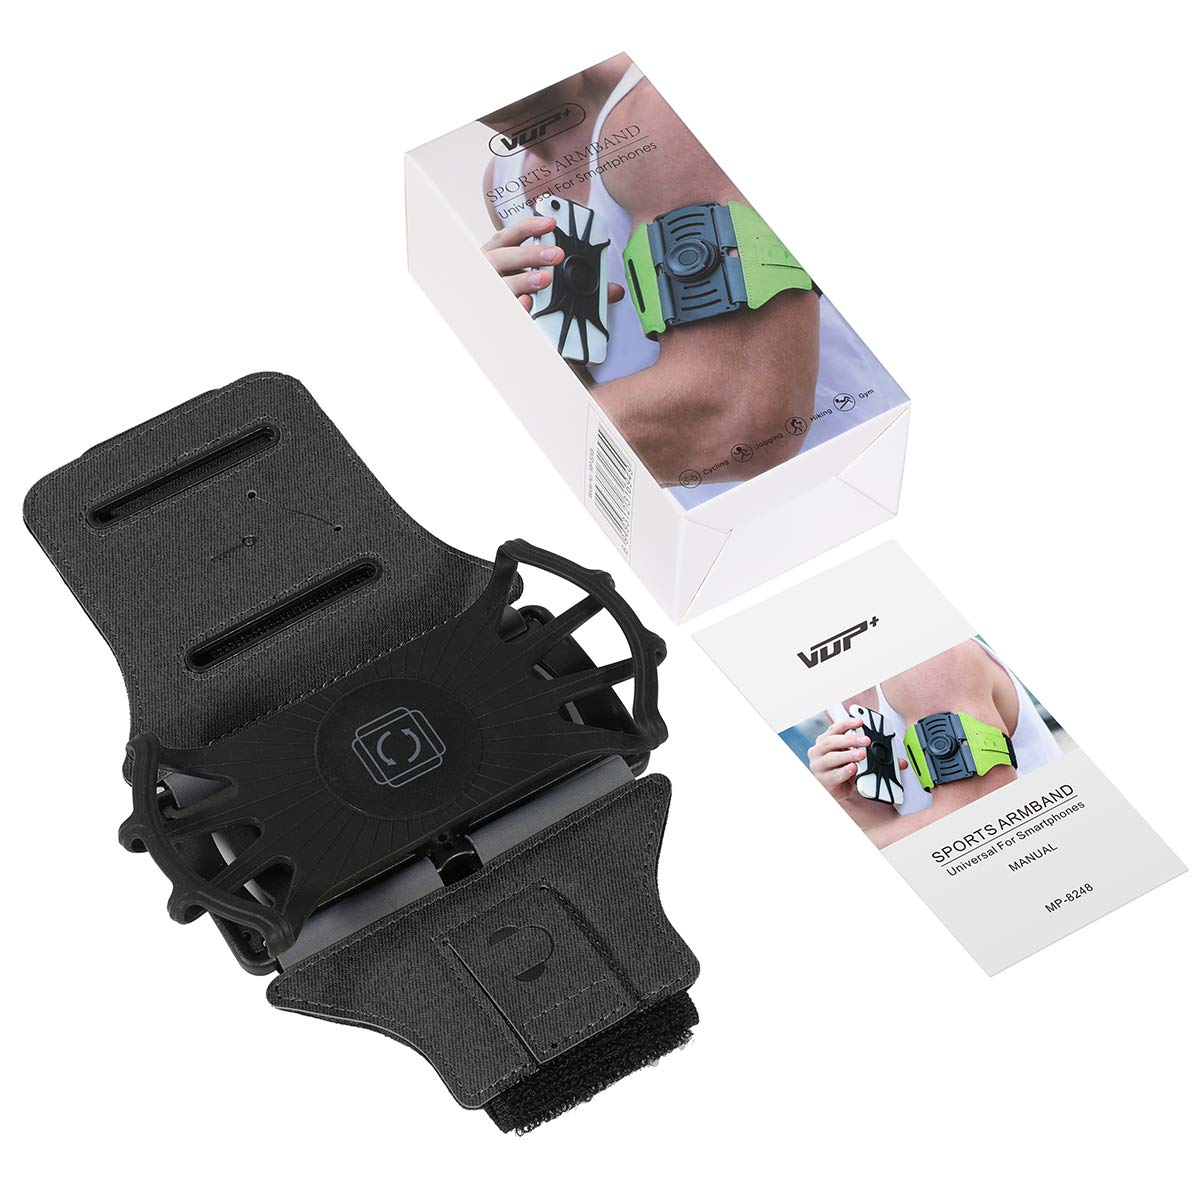 VUP Running Armband for iPhone Xs Max//Xs//XR// 8 Plus// 7 Plus// 6s Plus Note 4//5//8//9 Google Pixel 3//2 XL Black2 Galaxy S10 Plus// S9 Plus// S8 180/°Rotatable Phone Armband for Hiking Biking Walking